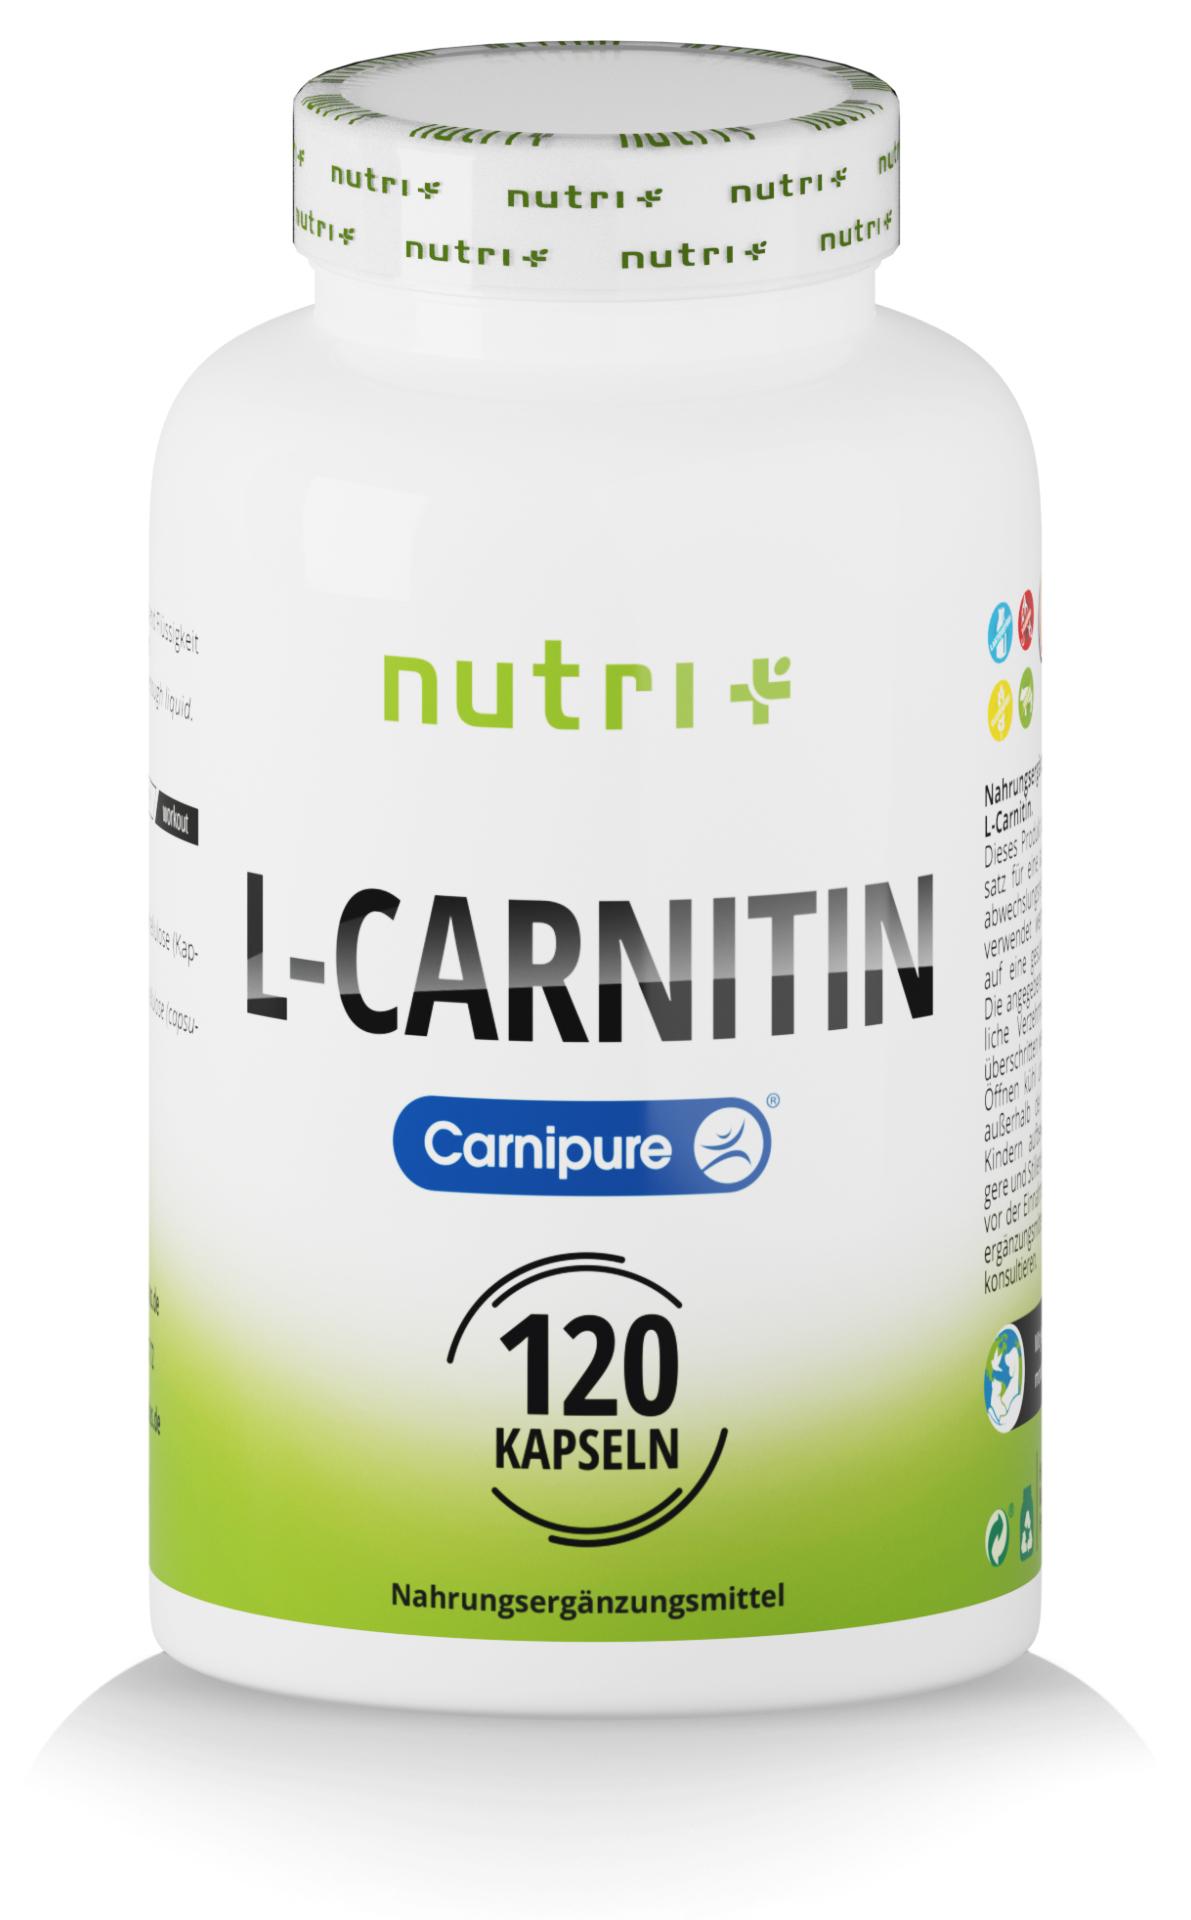 nutri+ L-Carnitin Kapseln (Carnipure®)